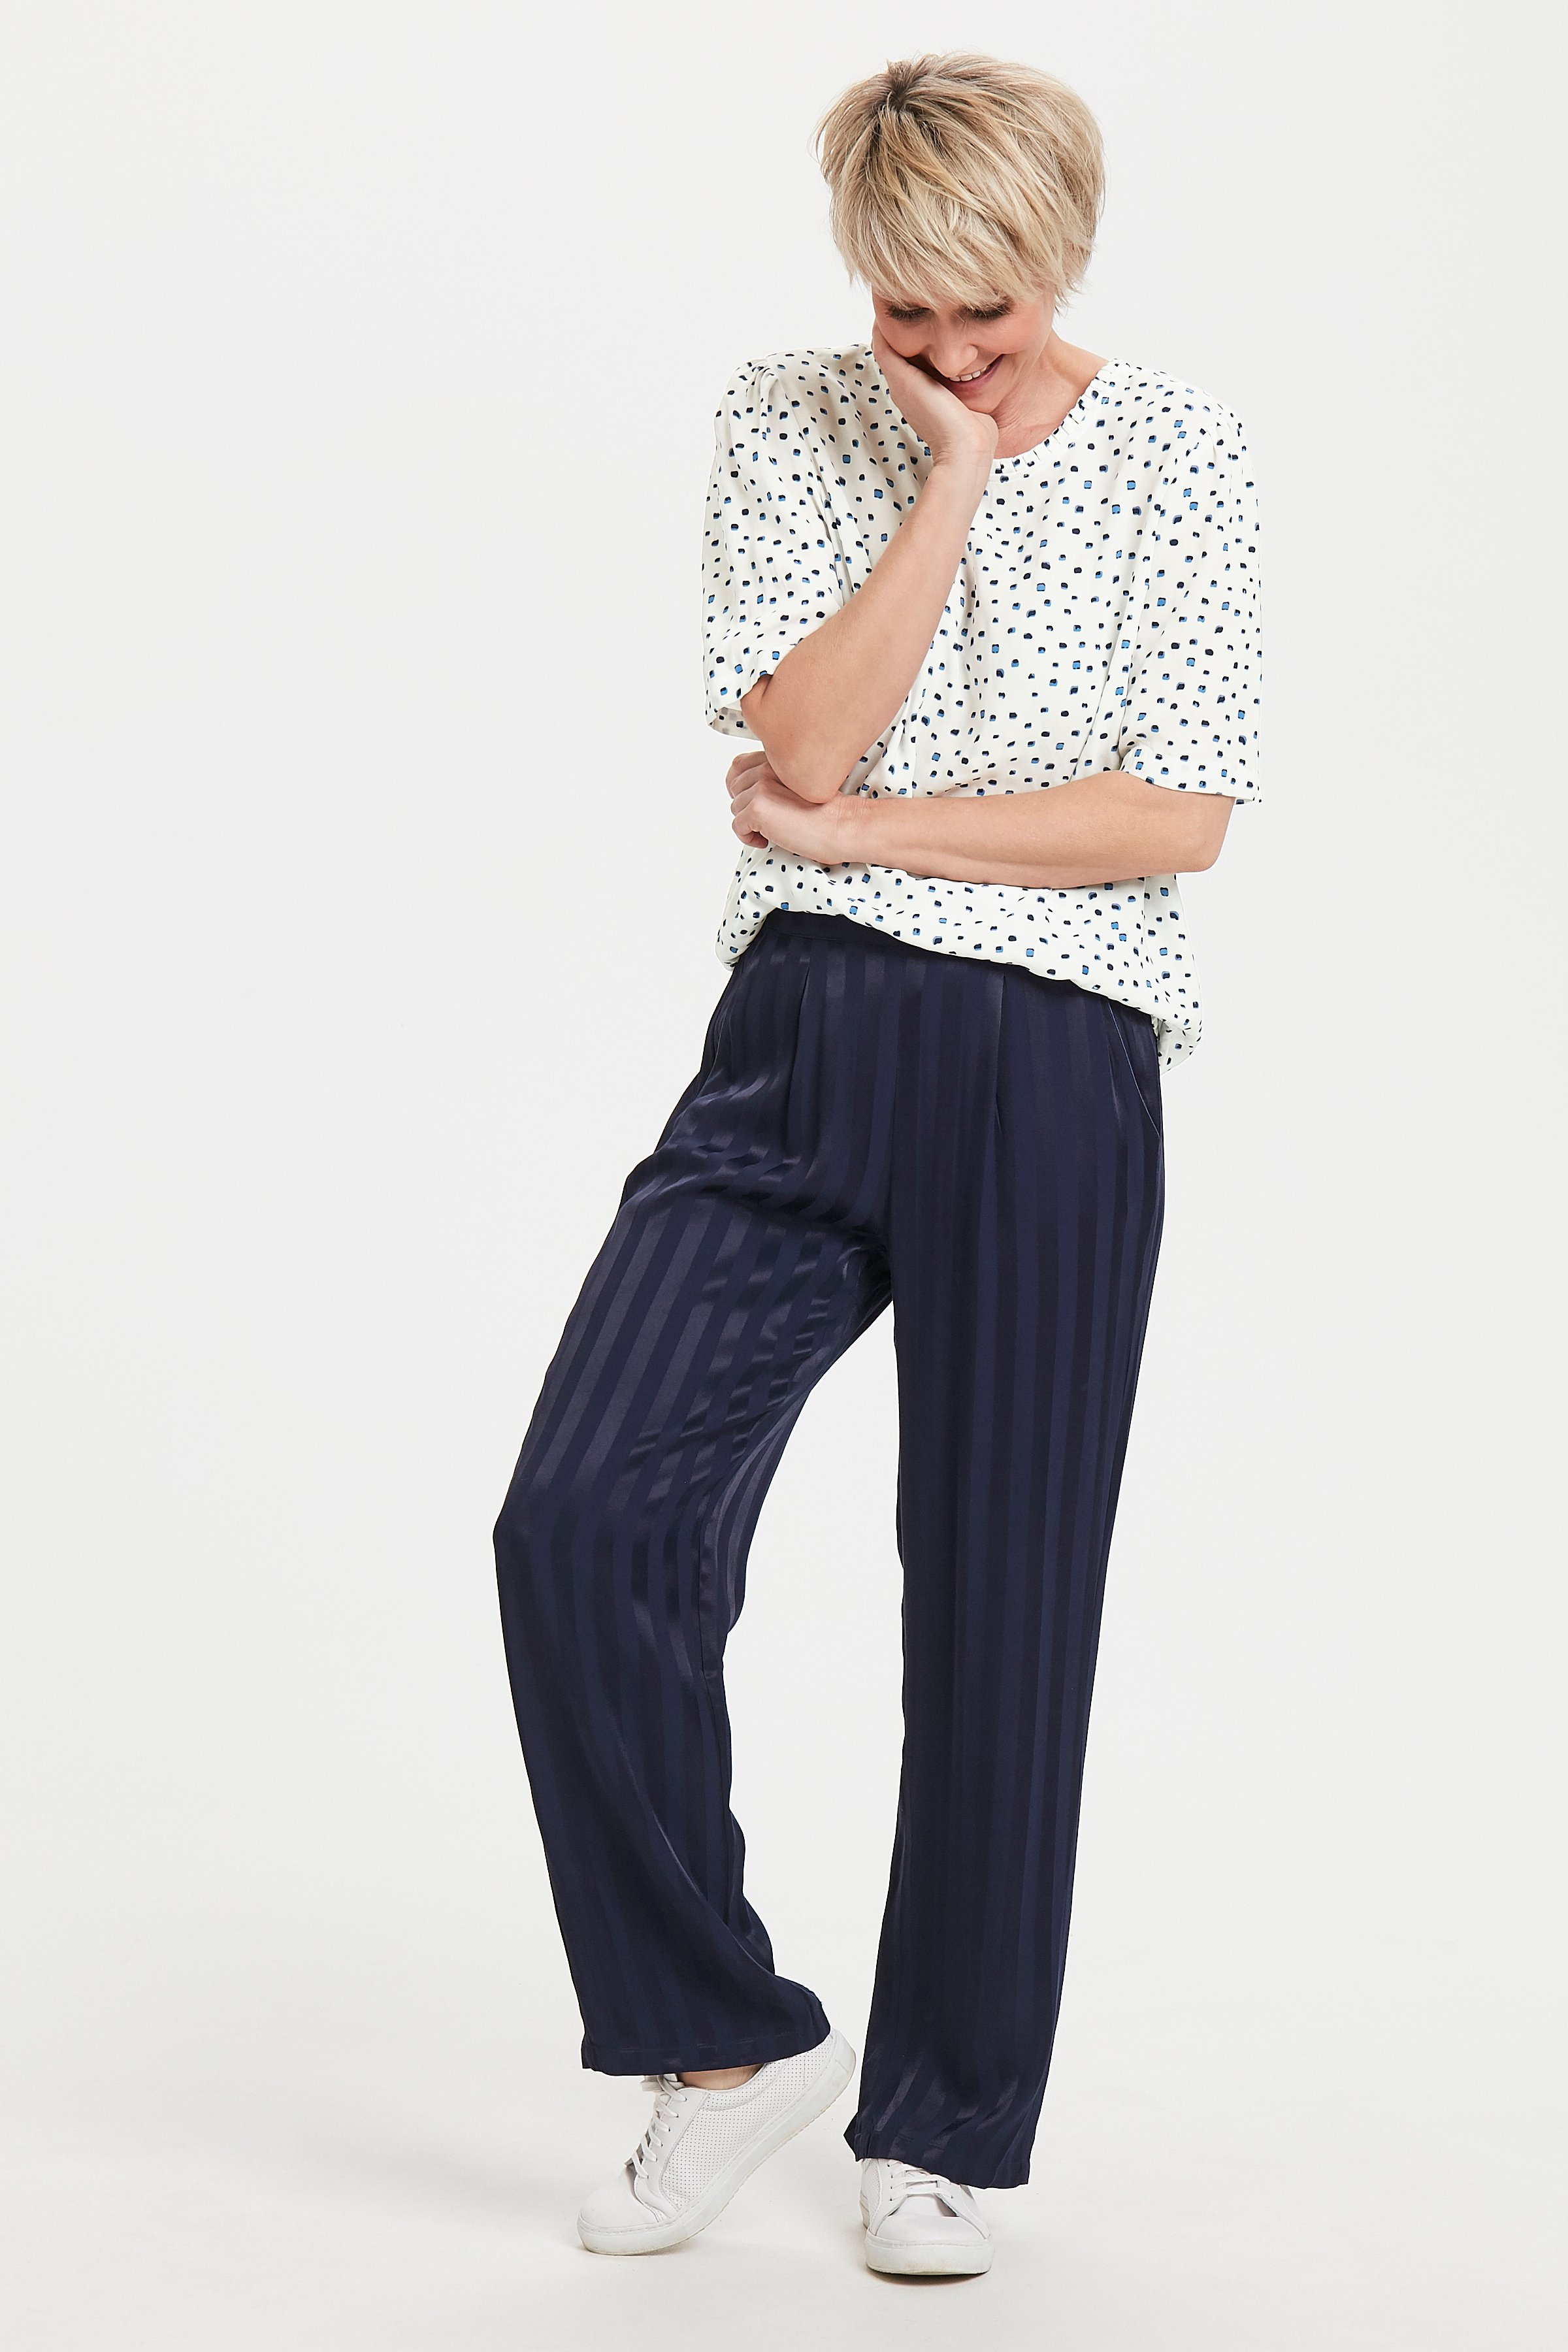 Off-white/blauw Korte mouwen shirt  van Dranella – Door Off-white/blauw Korte mouwen shirt  van maat. XS-XXL hier